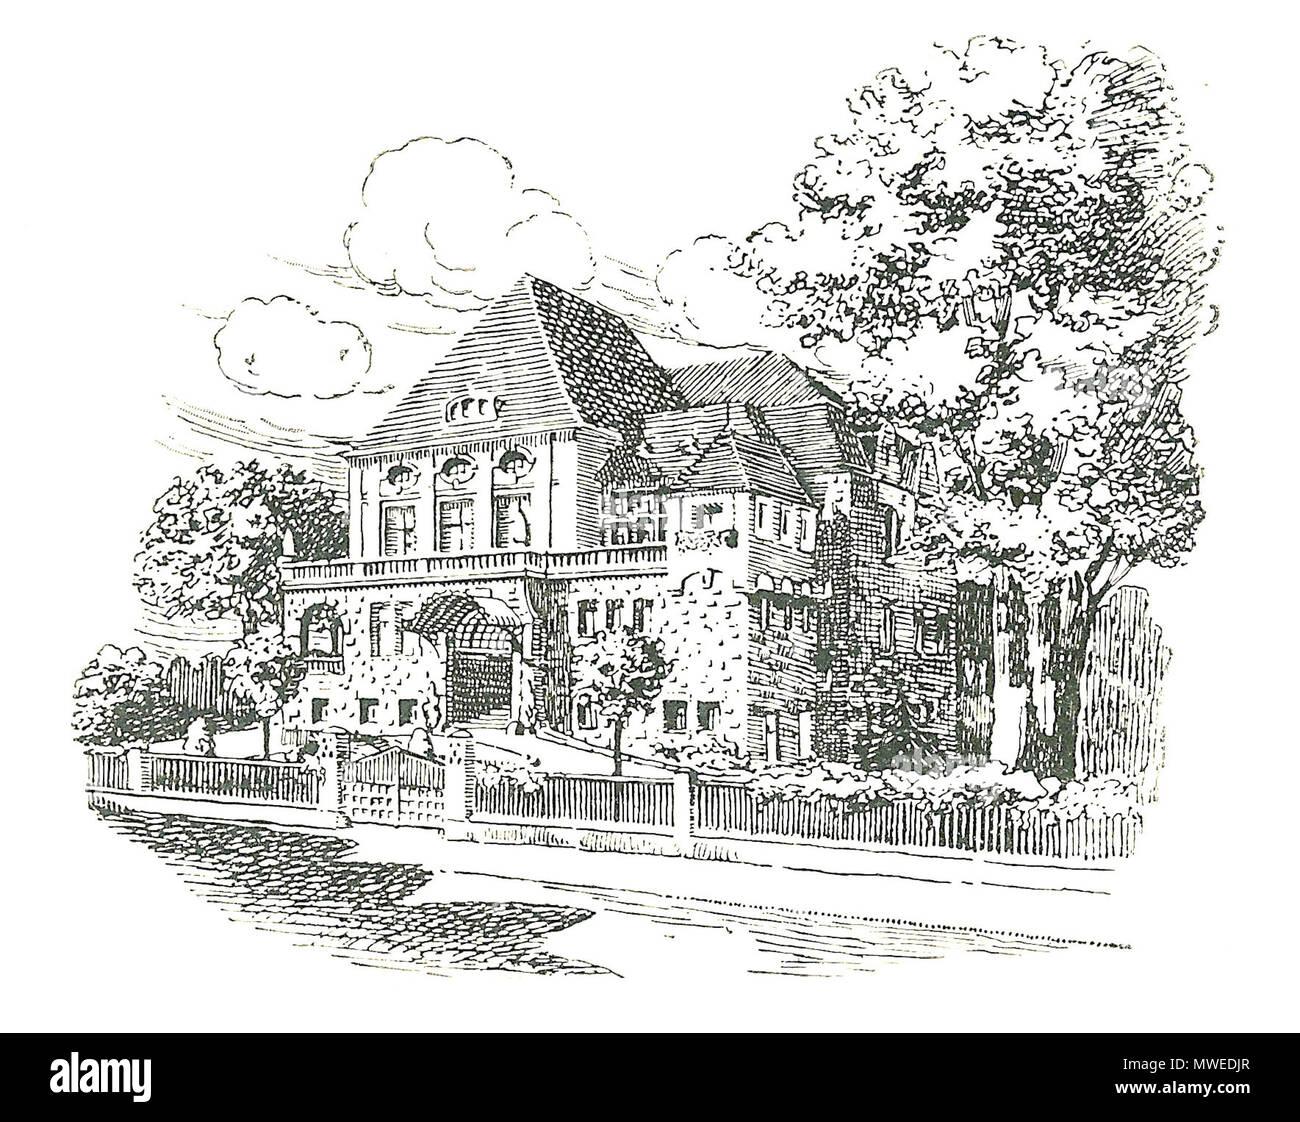 English Former House Of De Corps Franconia Jena Germany